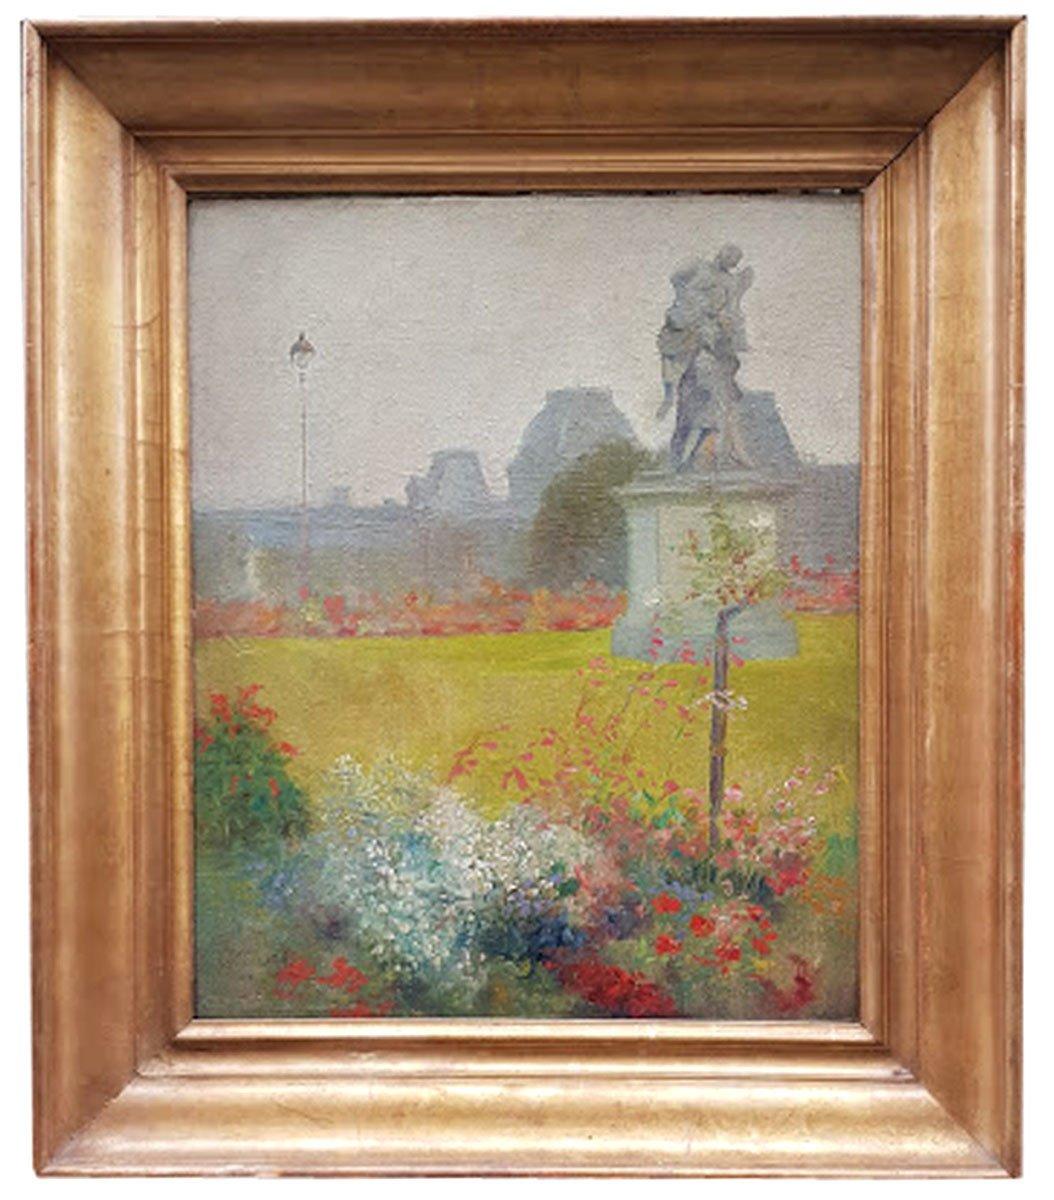 Oil On Canvas, The Tuileries Garden, By Nicolas Sicard